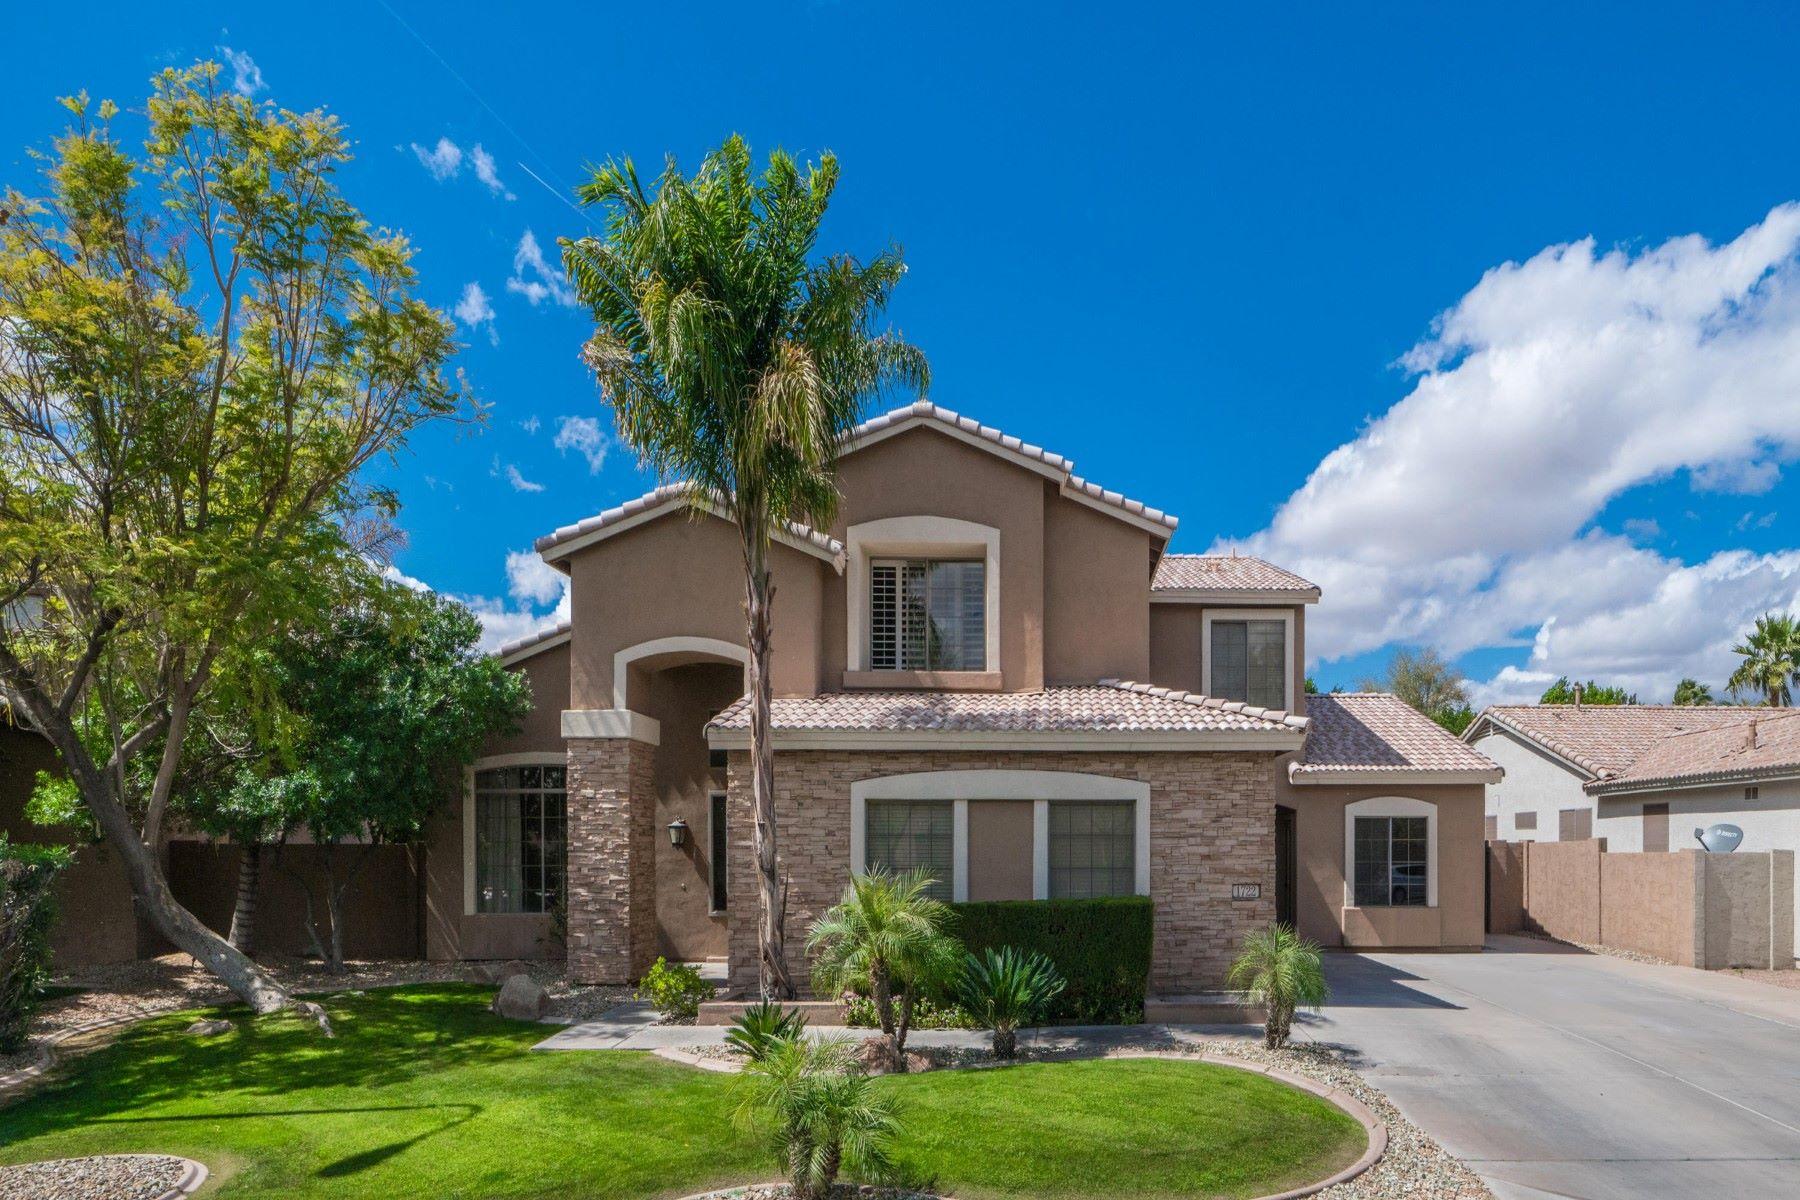 独户住宅 为 销售 在 Gorgeous Family Chandler Home 1722 S Los Altos Dr 钱德勒, 亚利桑那州 85286 美国